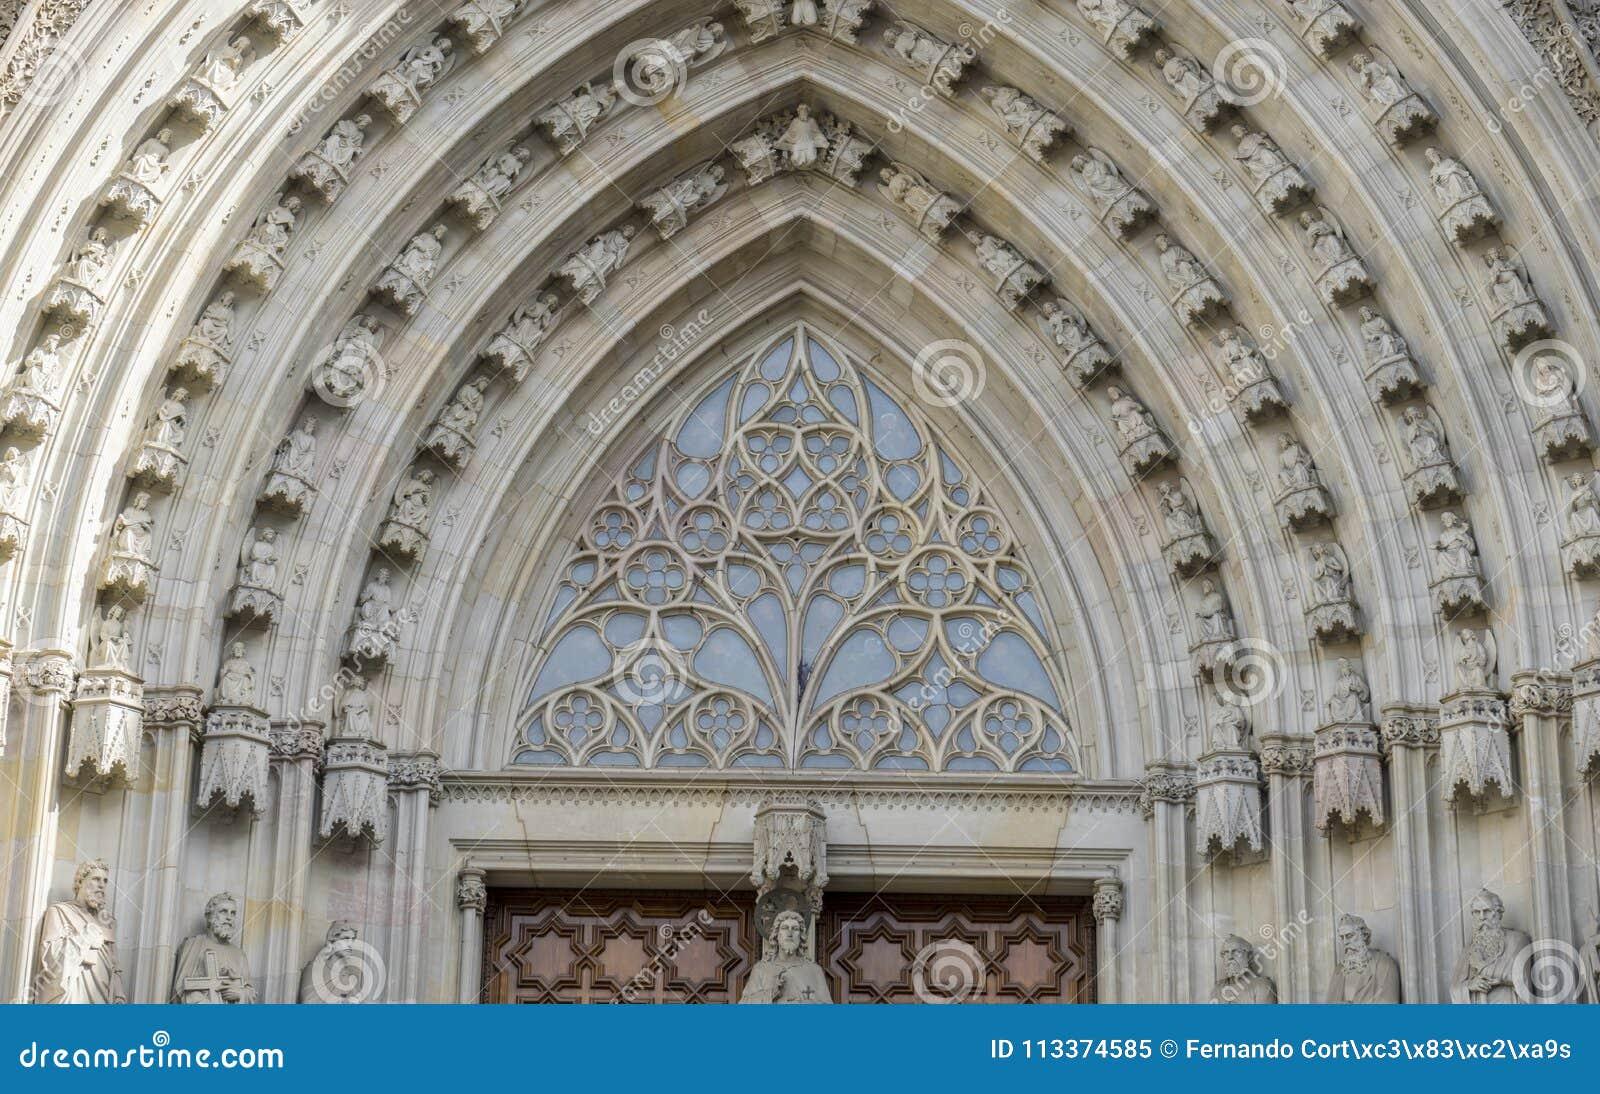 Tubo principal, fachada católica gótica Barcelona Cataluña de la catedral